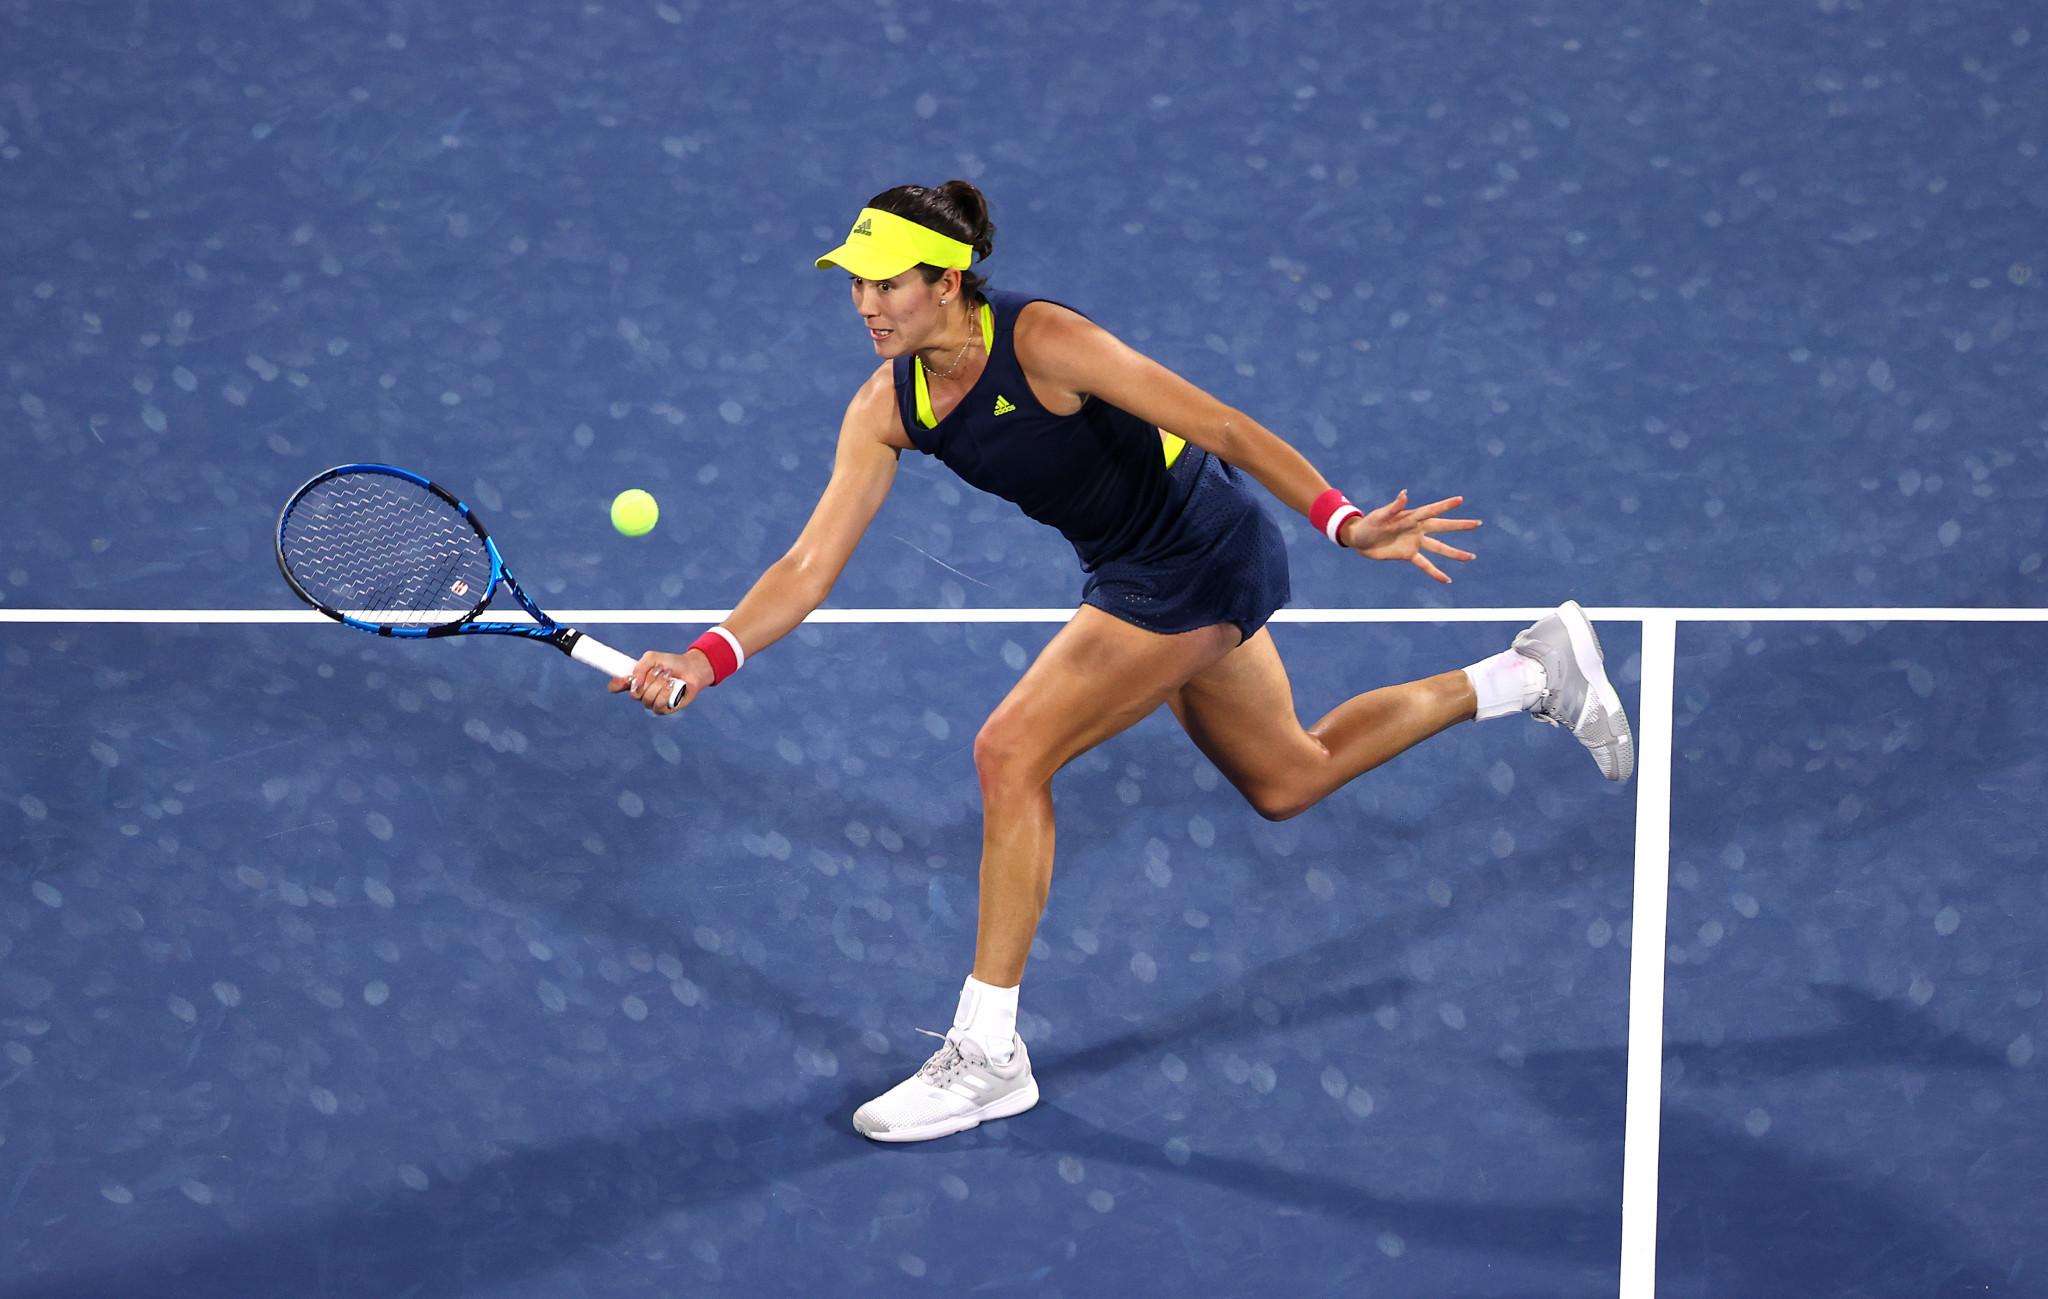 Muguruza to face Krejcikova in final of WTA Dubai Tennis Championships